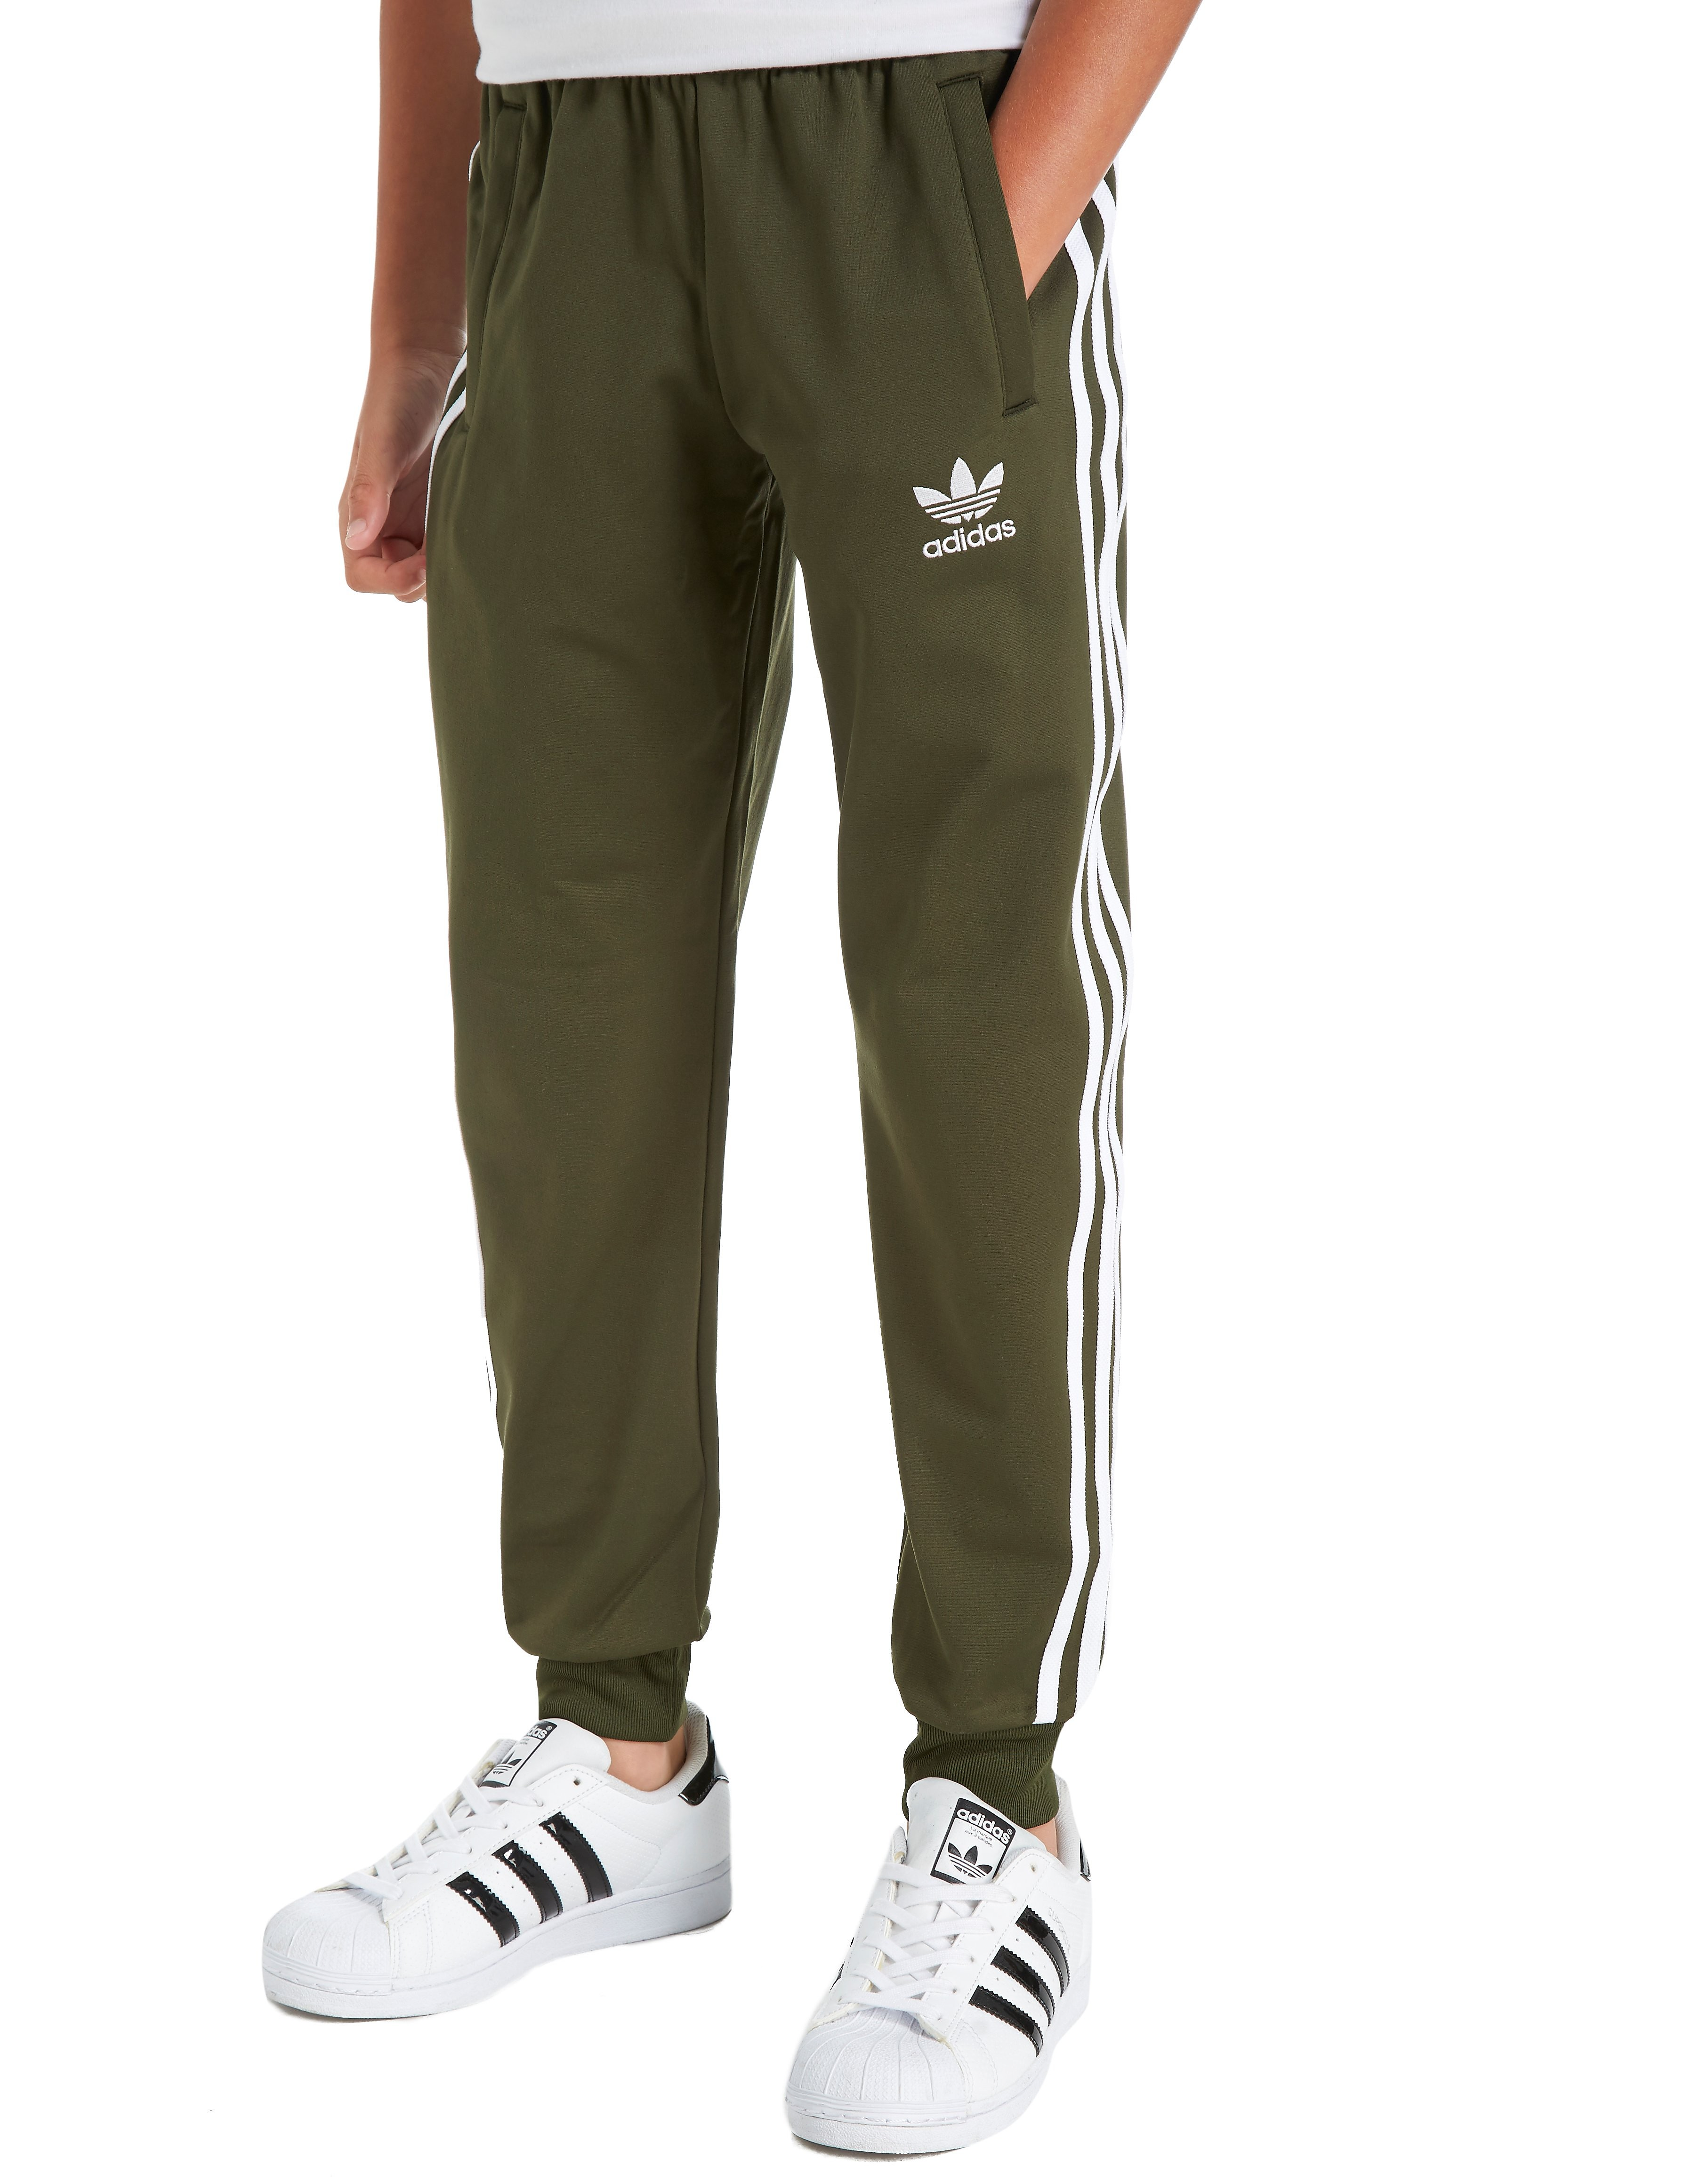 adidas Originals Superstar Pant Junior